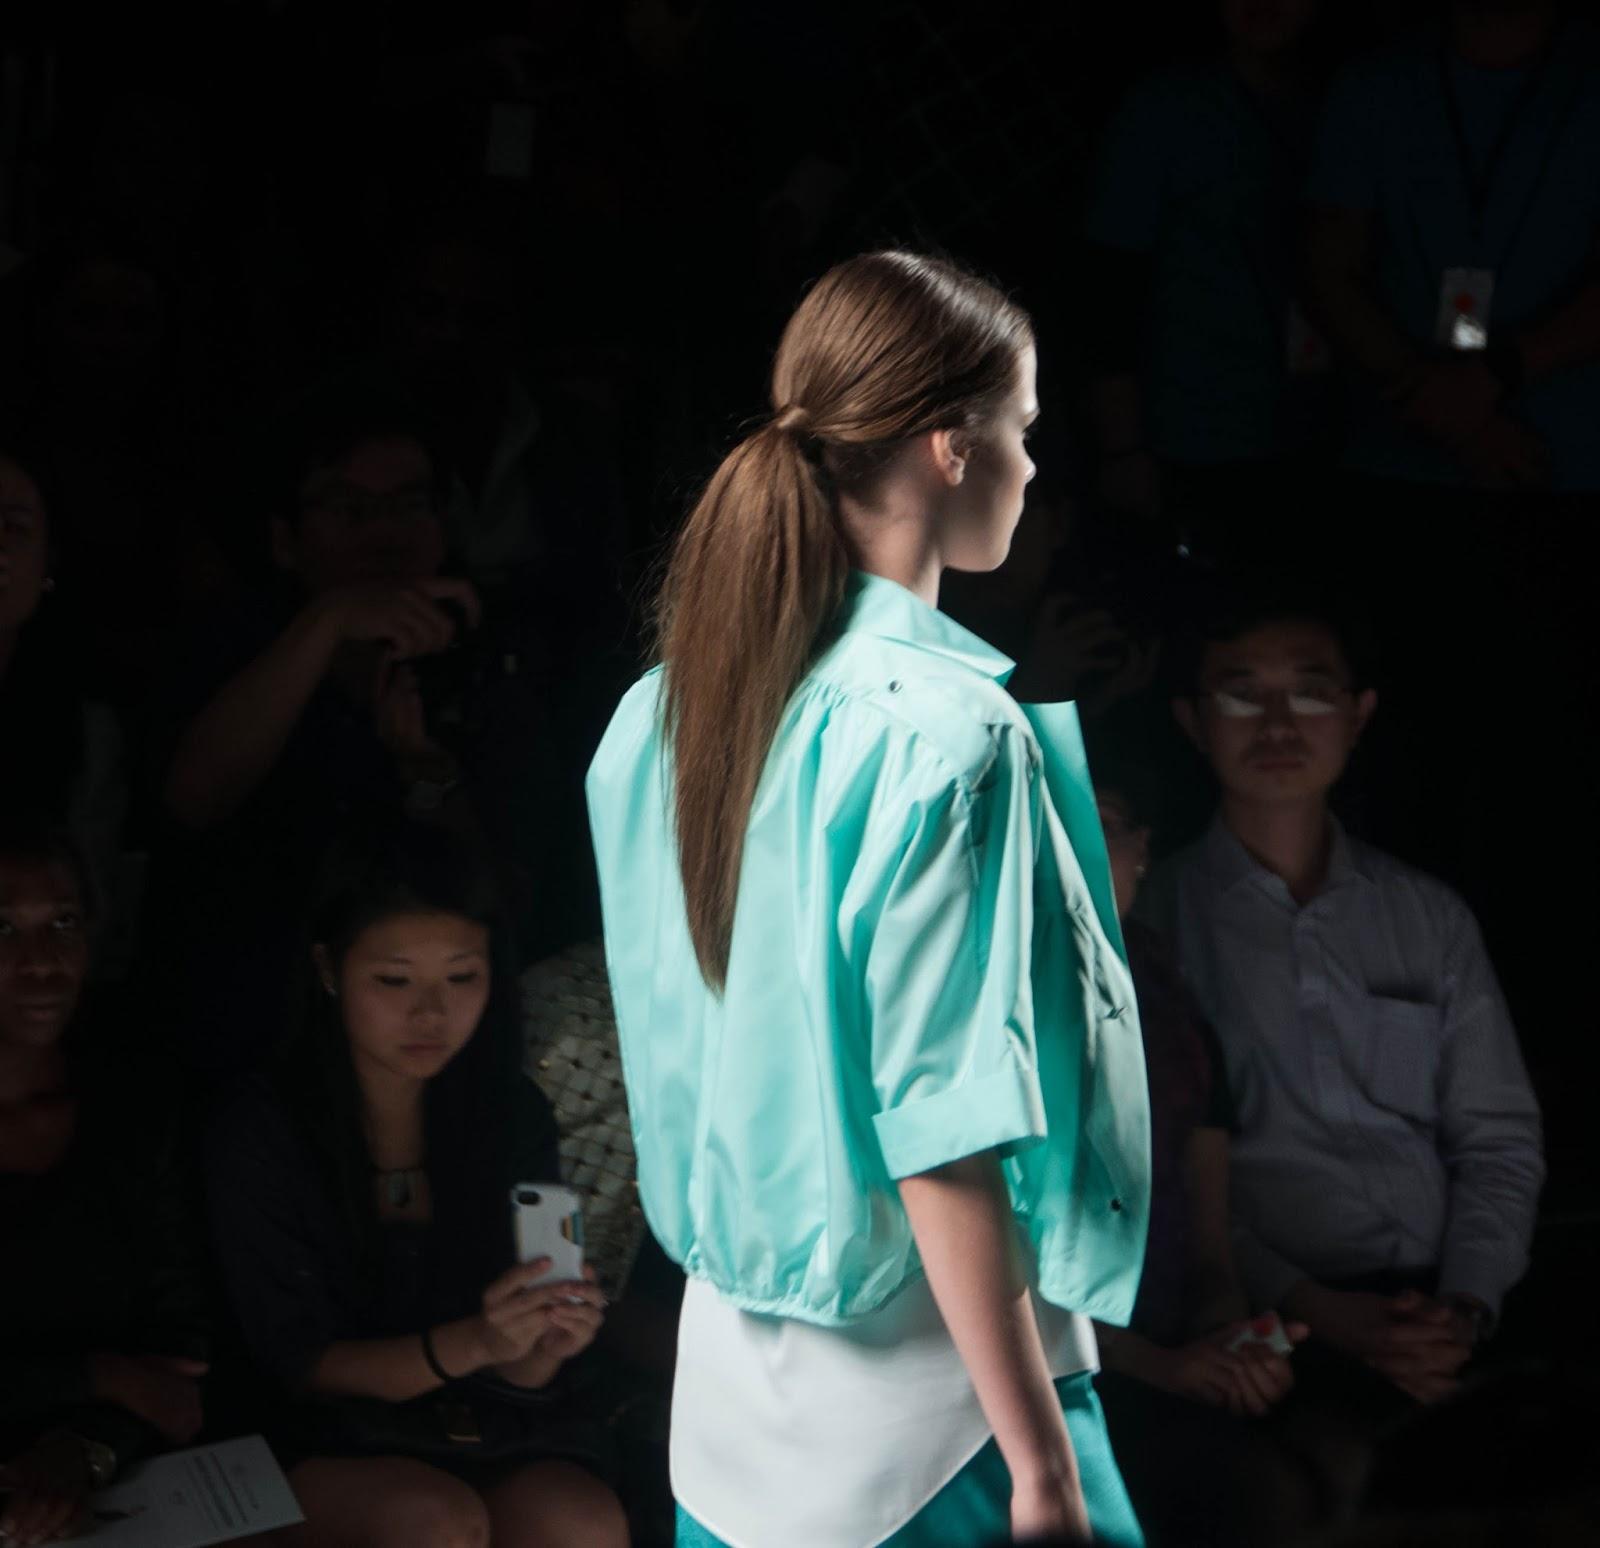 new york fashion week SS14, new york fashion week, new york fashion week designers, ellassay, ellassay new york runway, spring and summer fashion